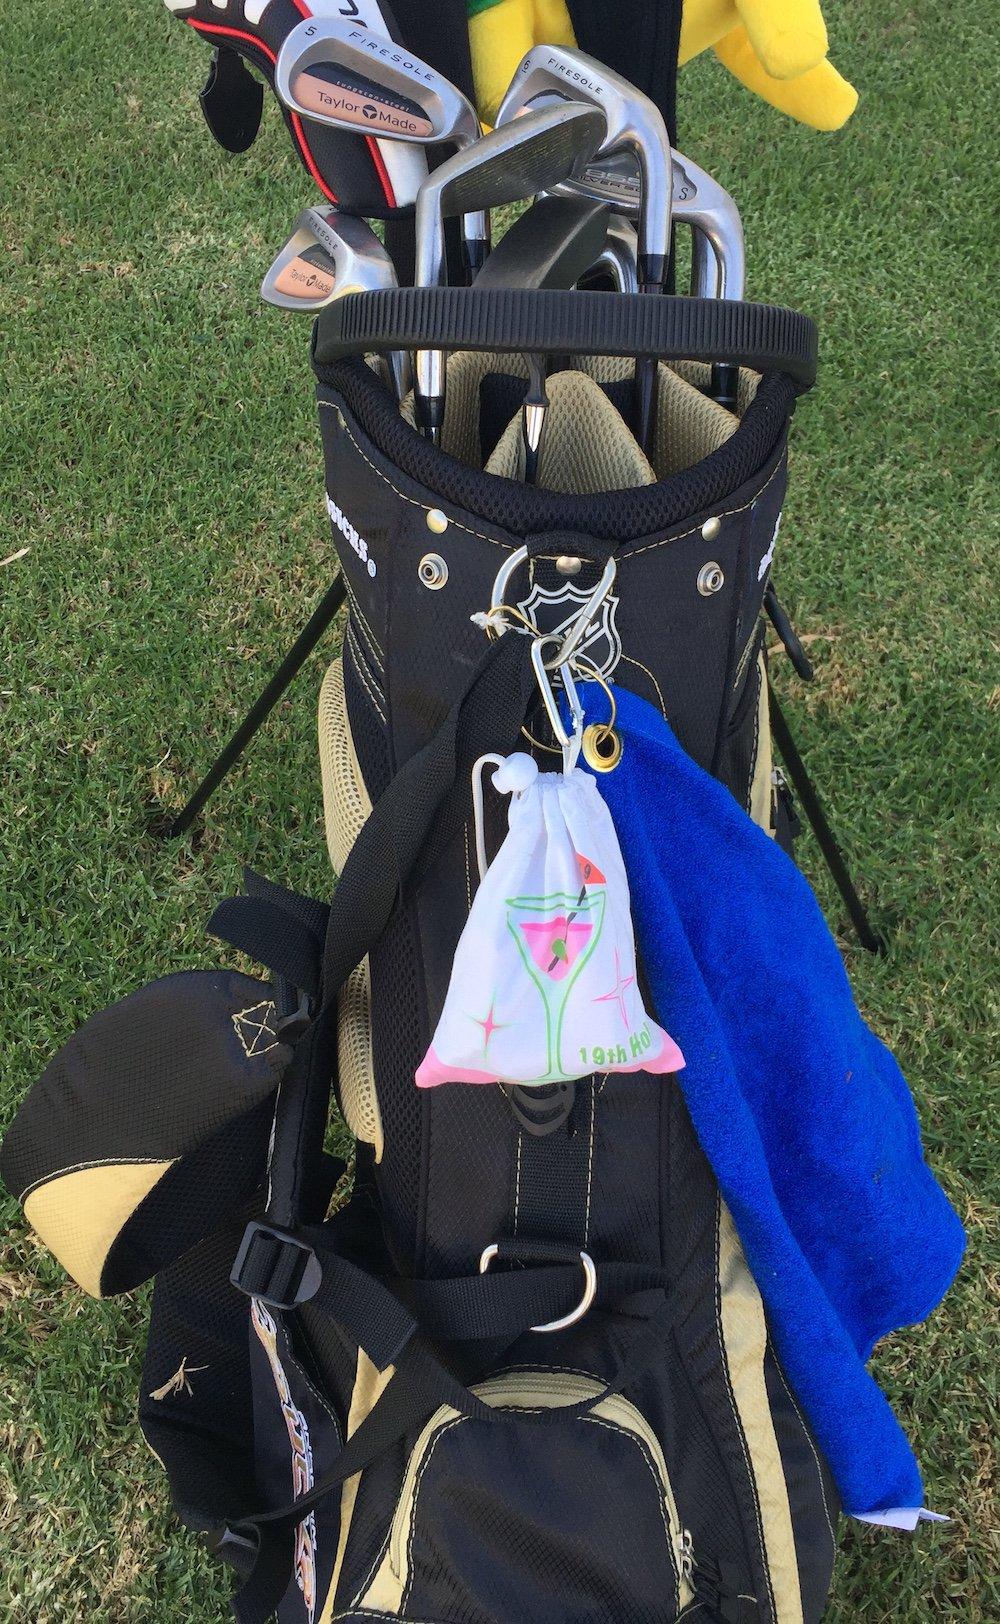 Giggle Golf 19th Hole Towel & Tee Bag Combo